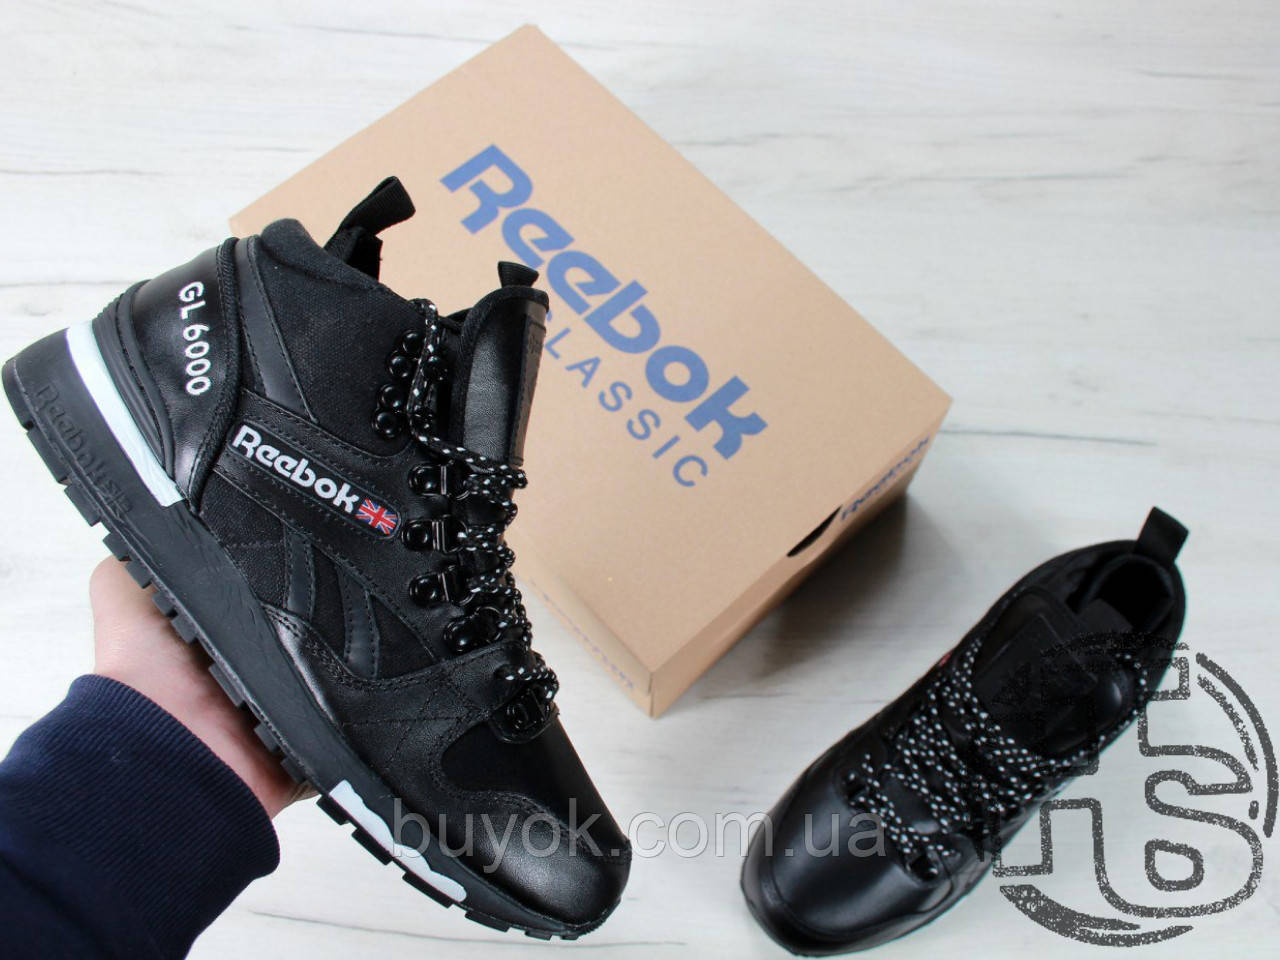 Мужские кроссовки Reebok GL6000 High-Top Winter Black 42